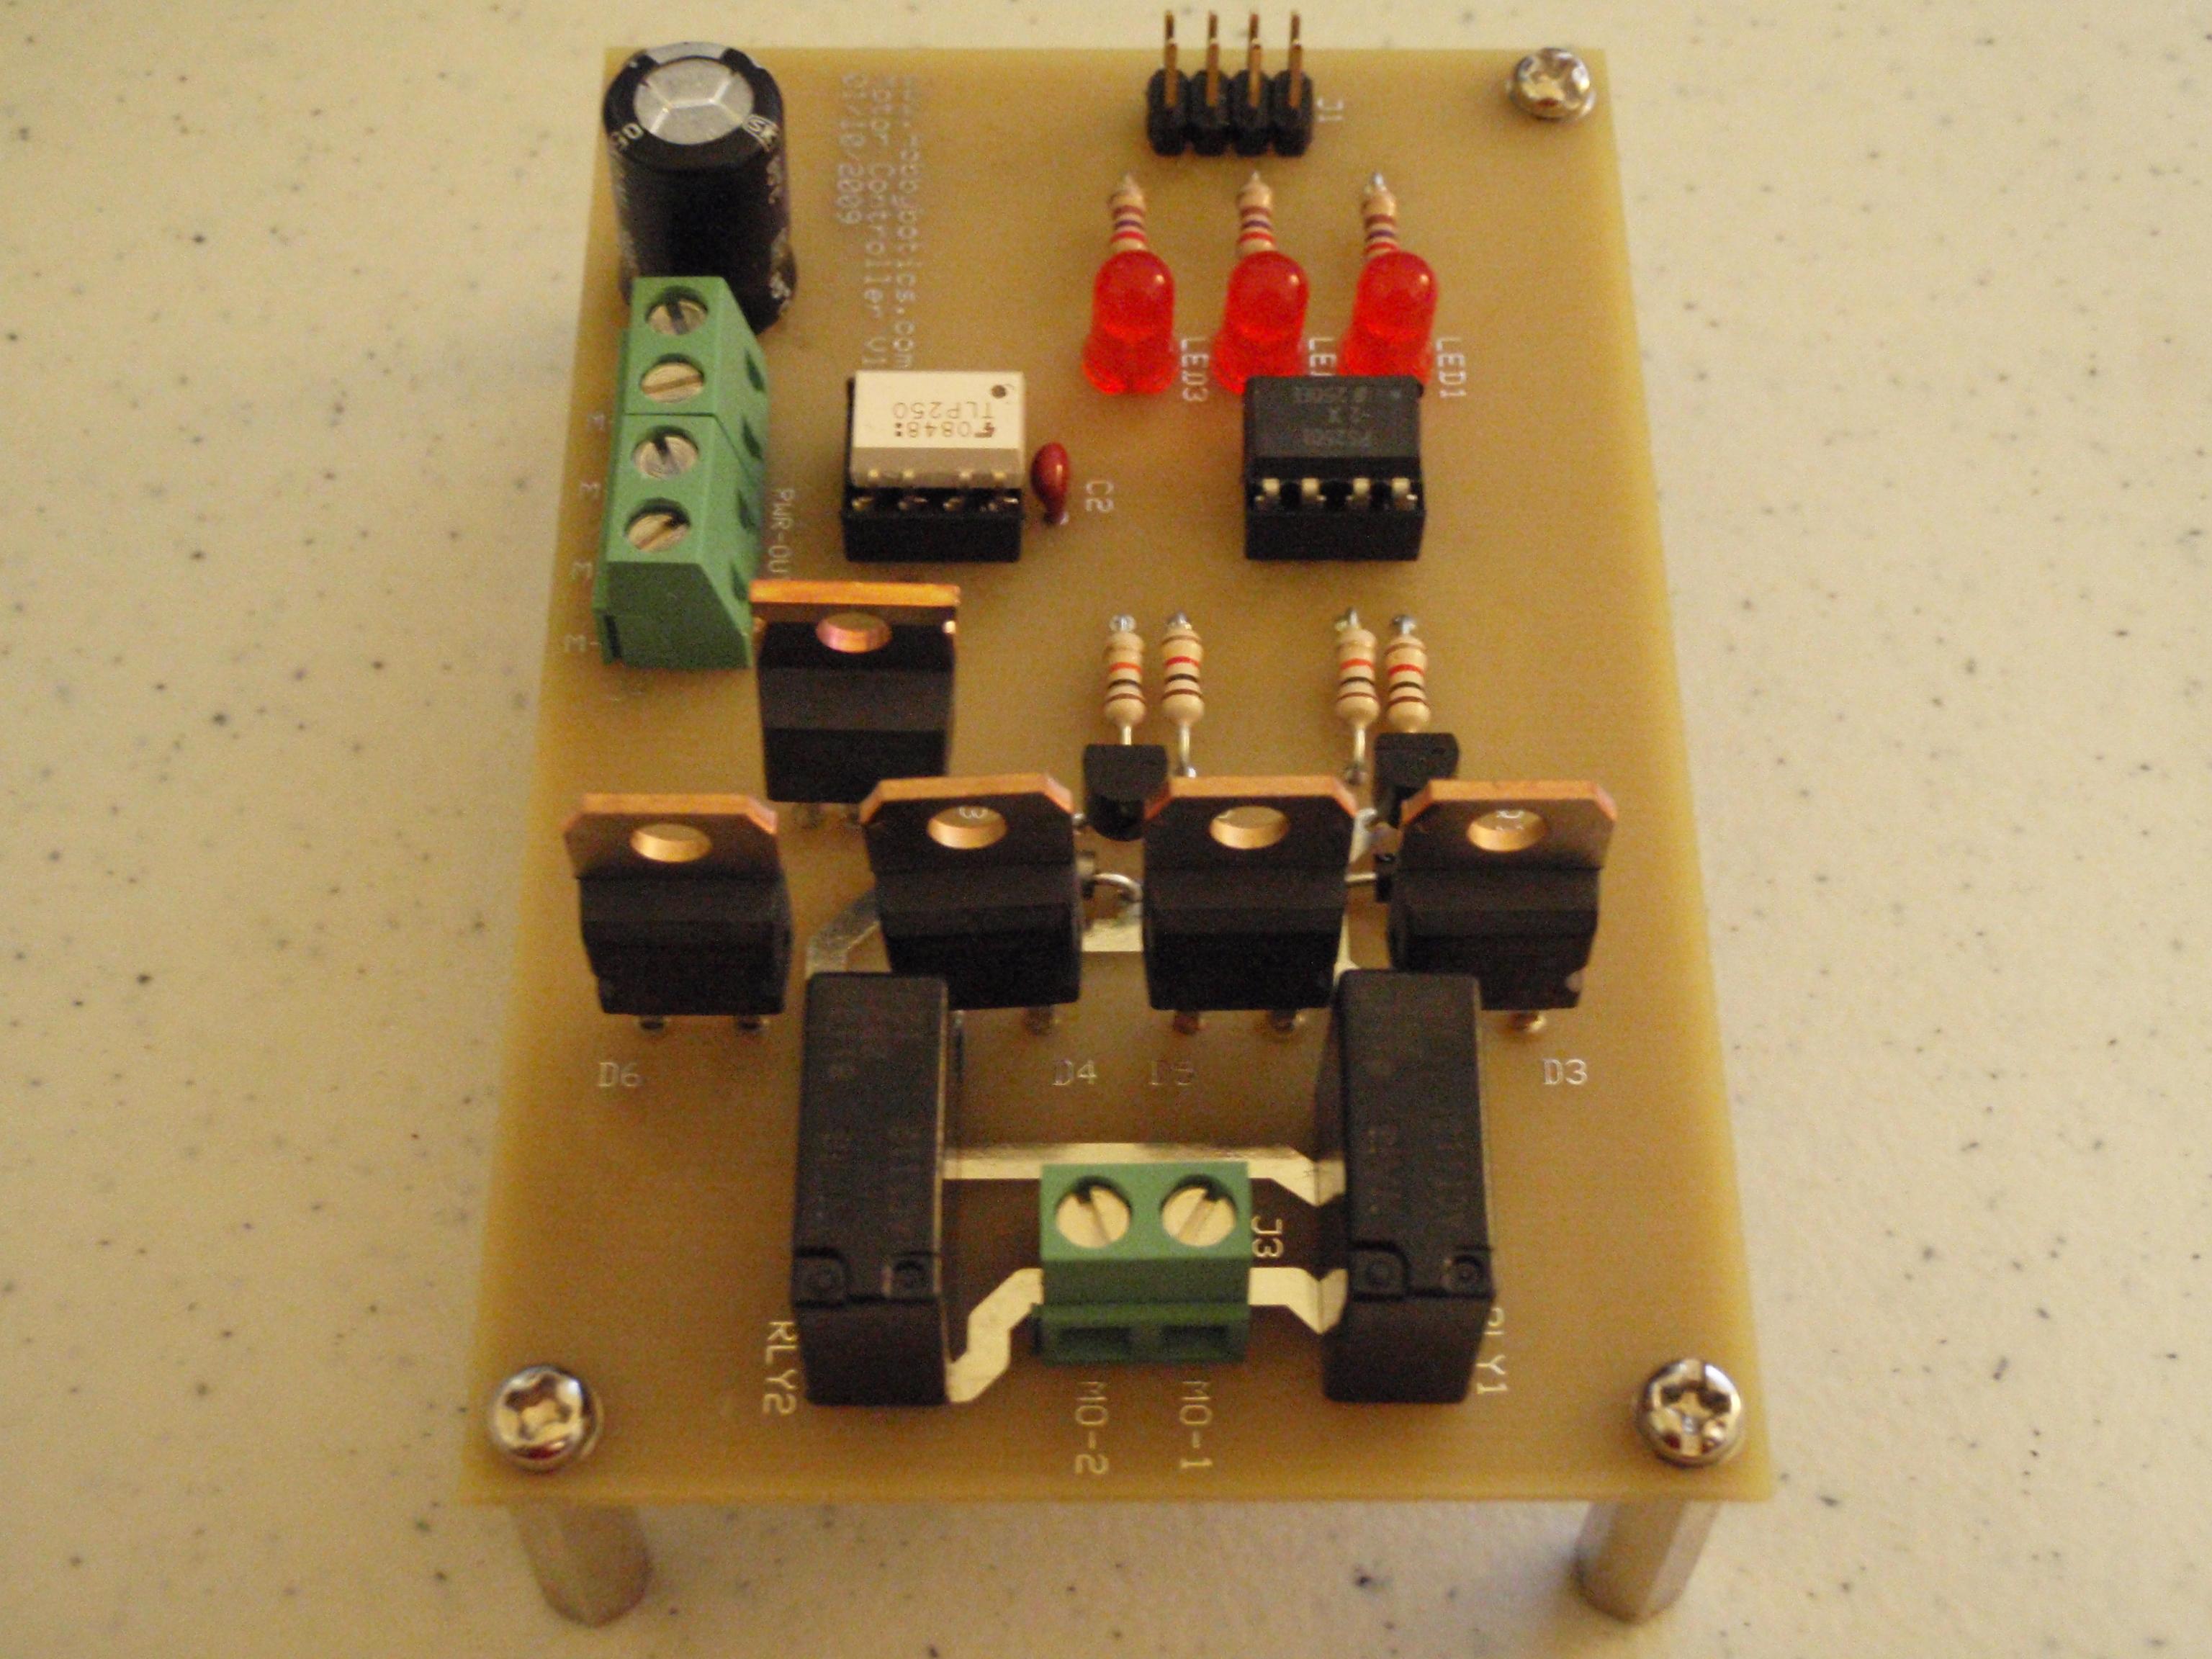 Hobbybotics Motor Controller V10 Control Relay Circuit Specifications